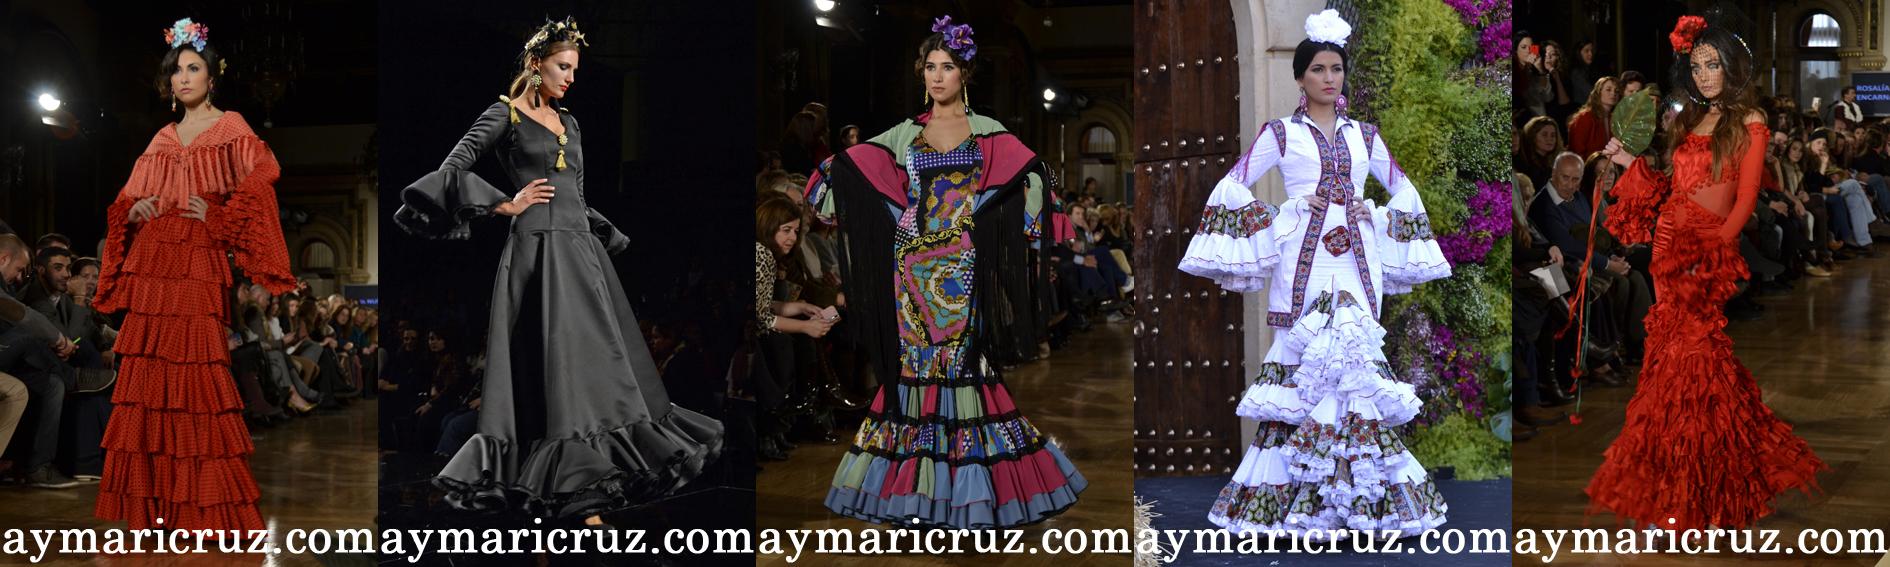 40 trajes para ir a la Feria de Sevilla 2014 (3ª parte)